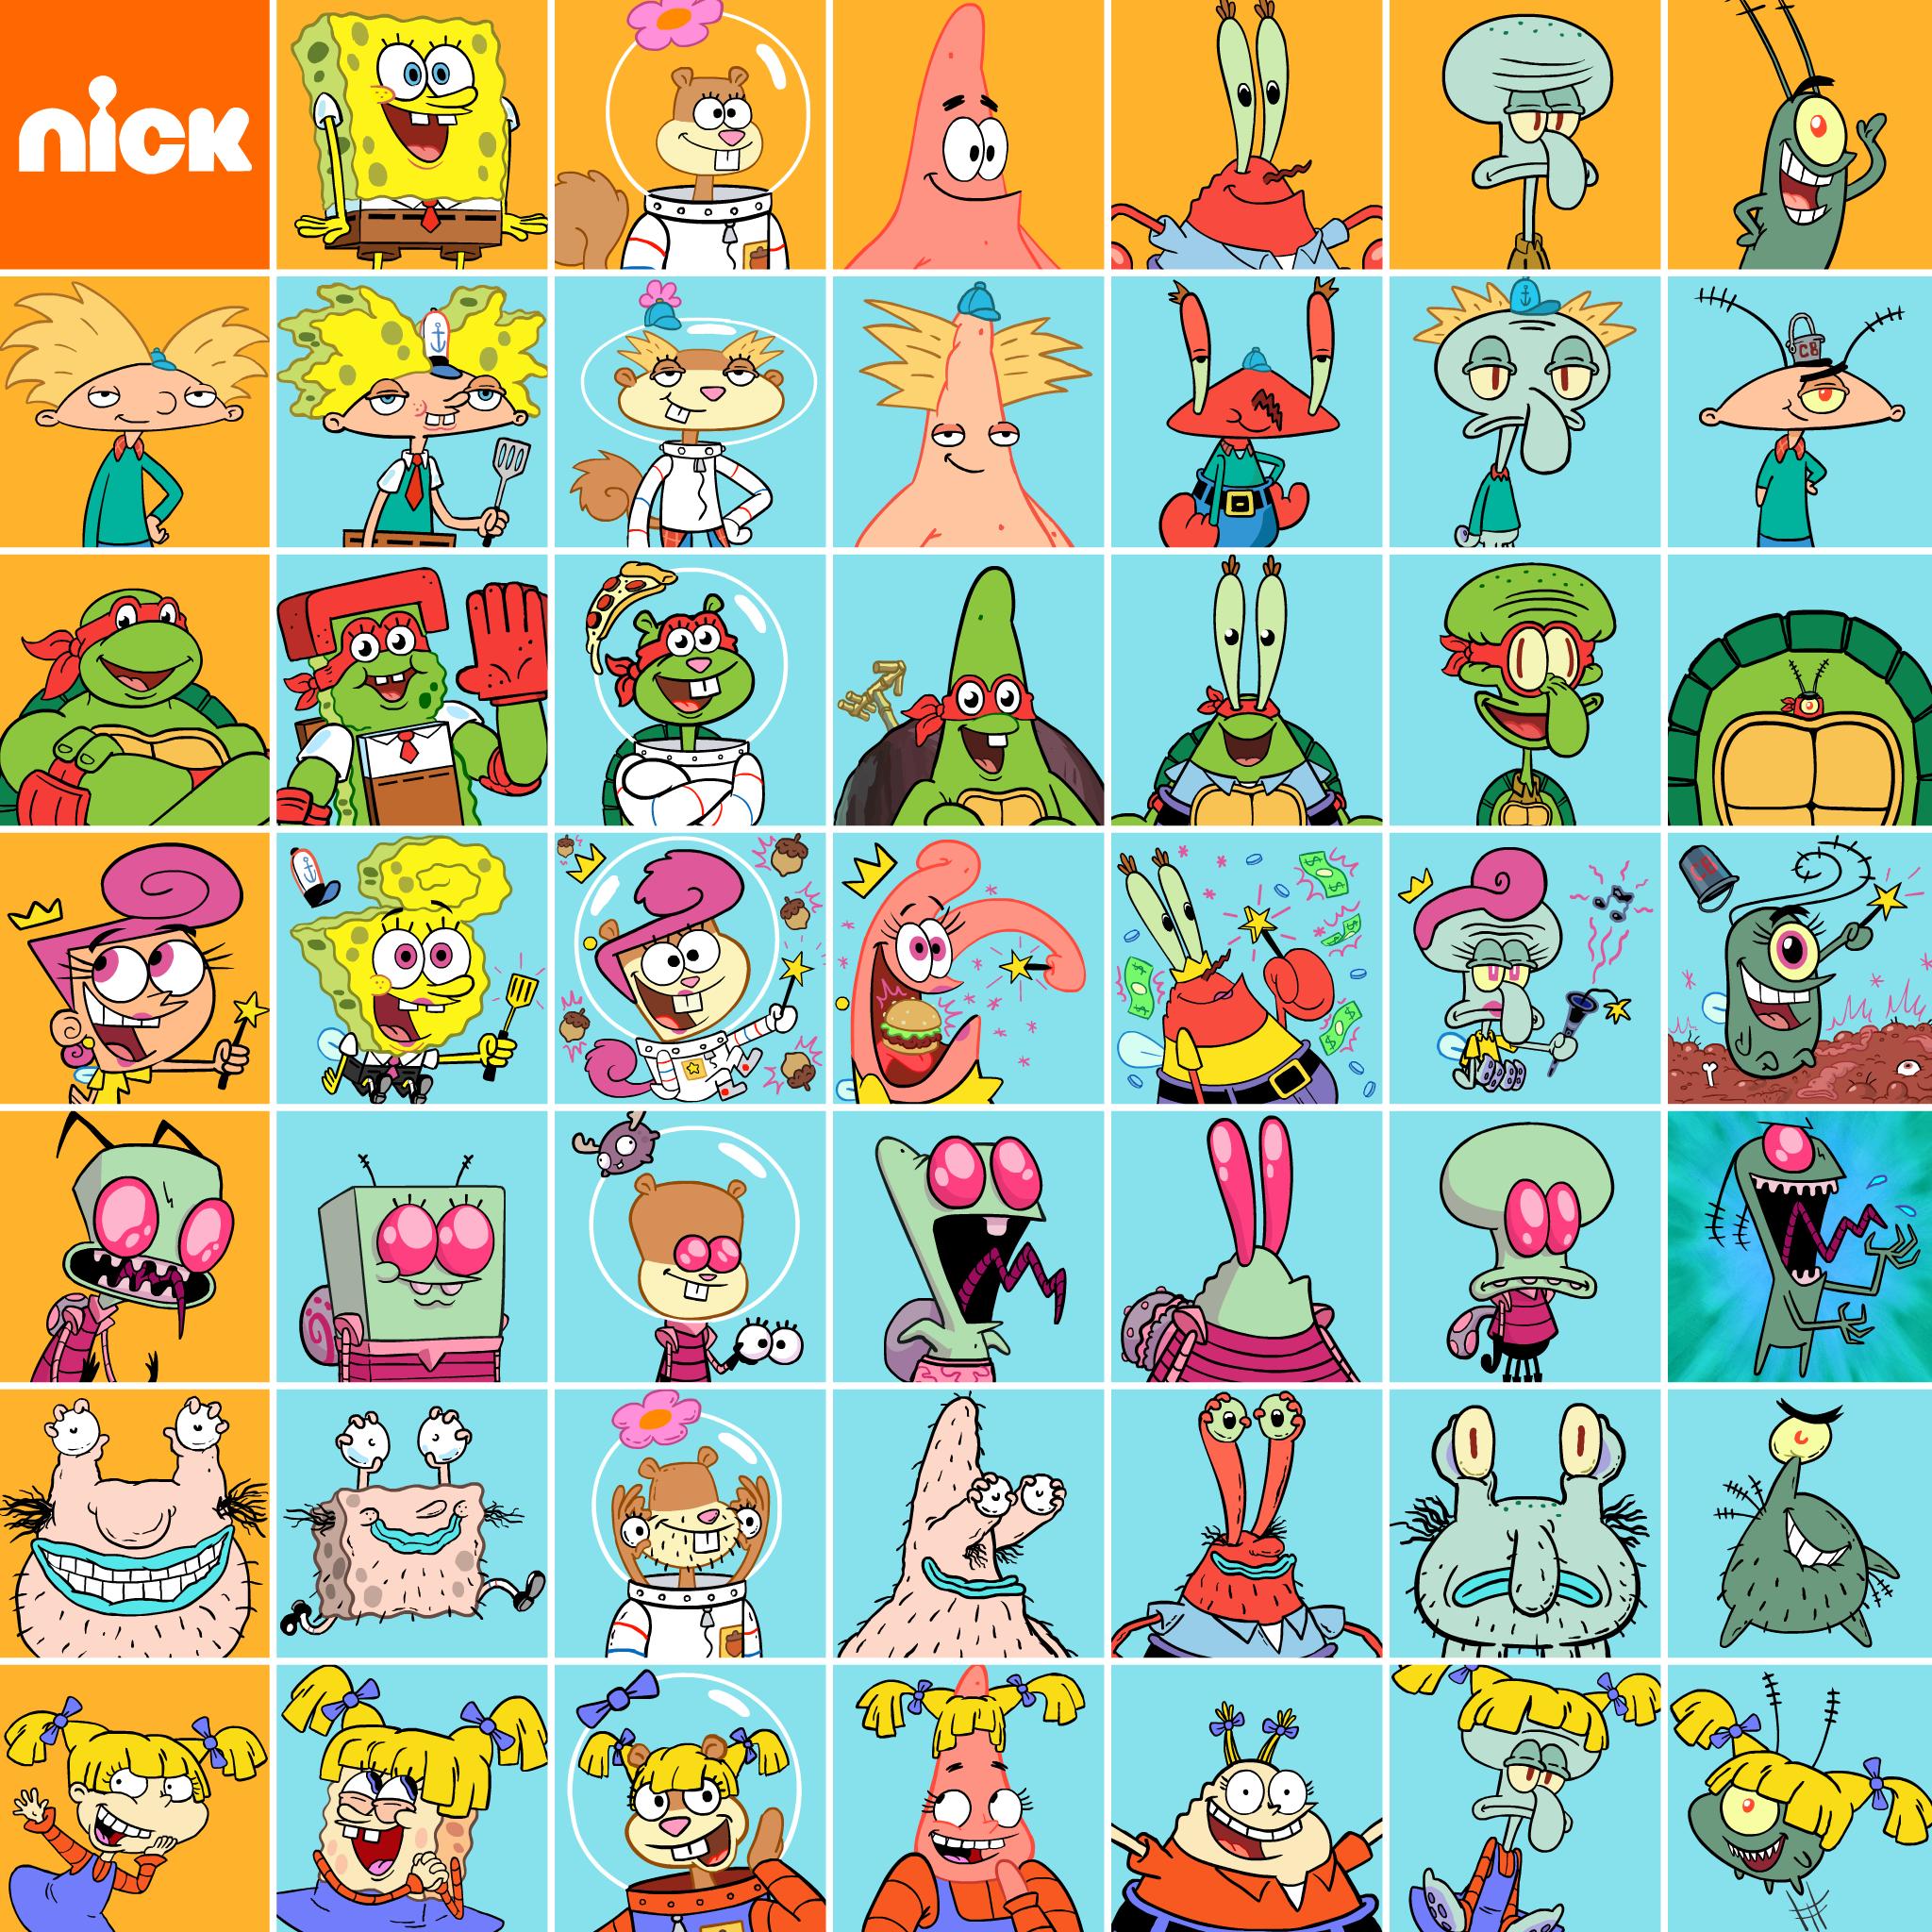 Thumbnail for SpongeBob x Nickelodeon Mashup Matrix